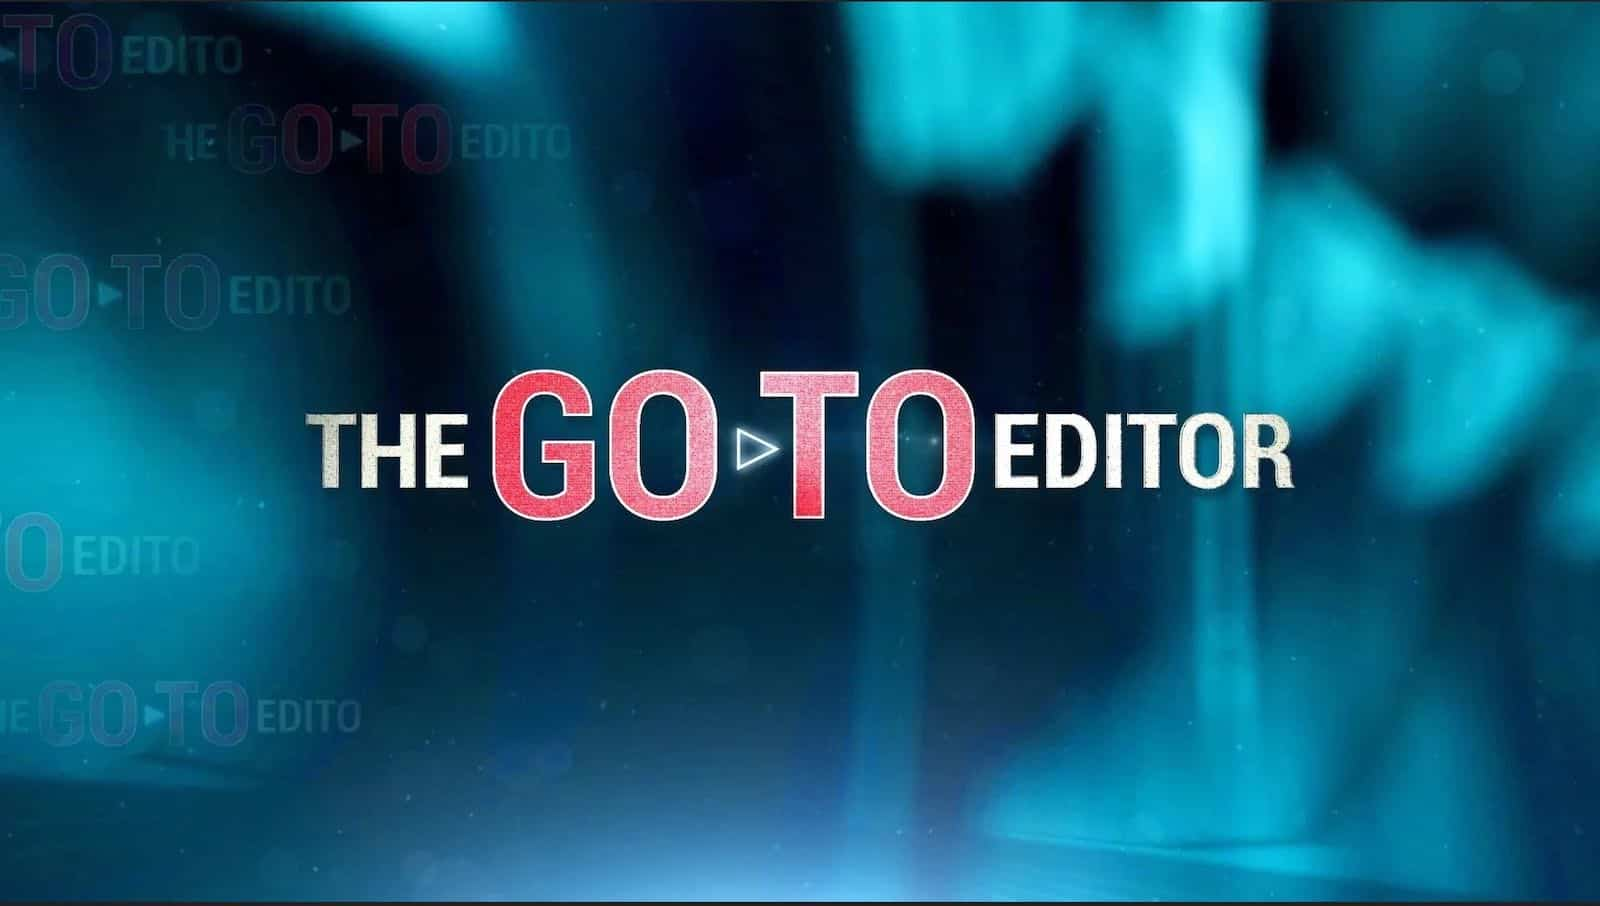 The go-to editor logo